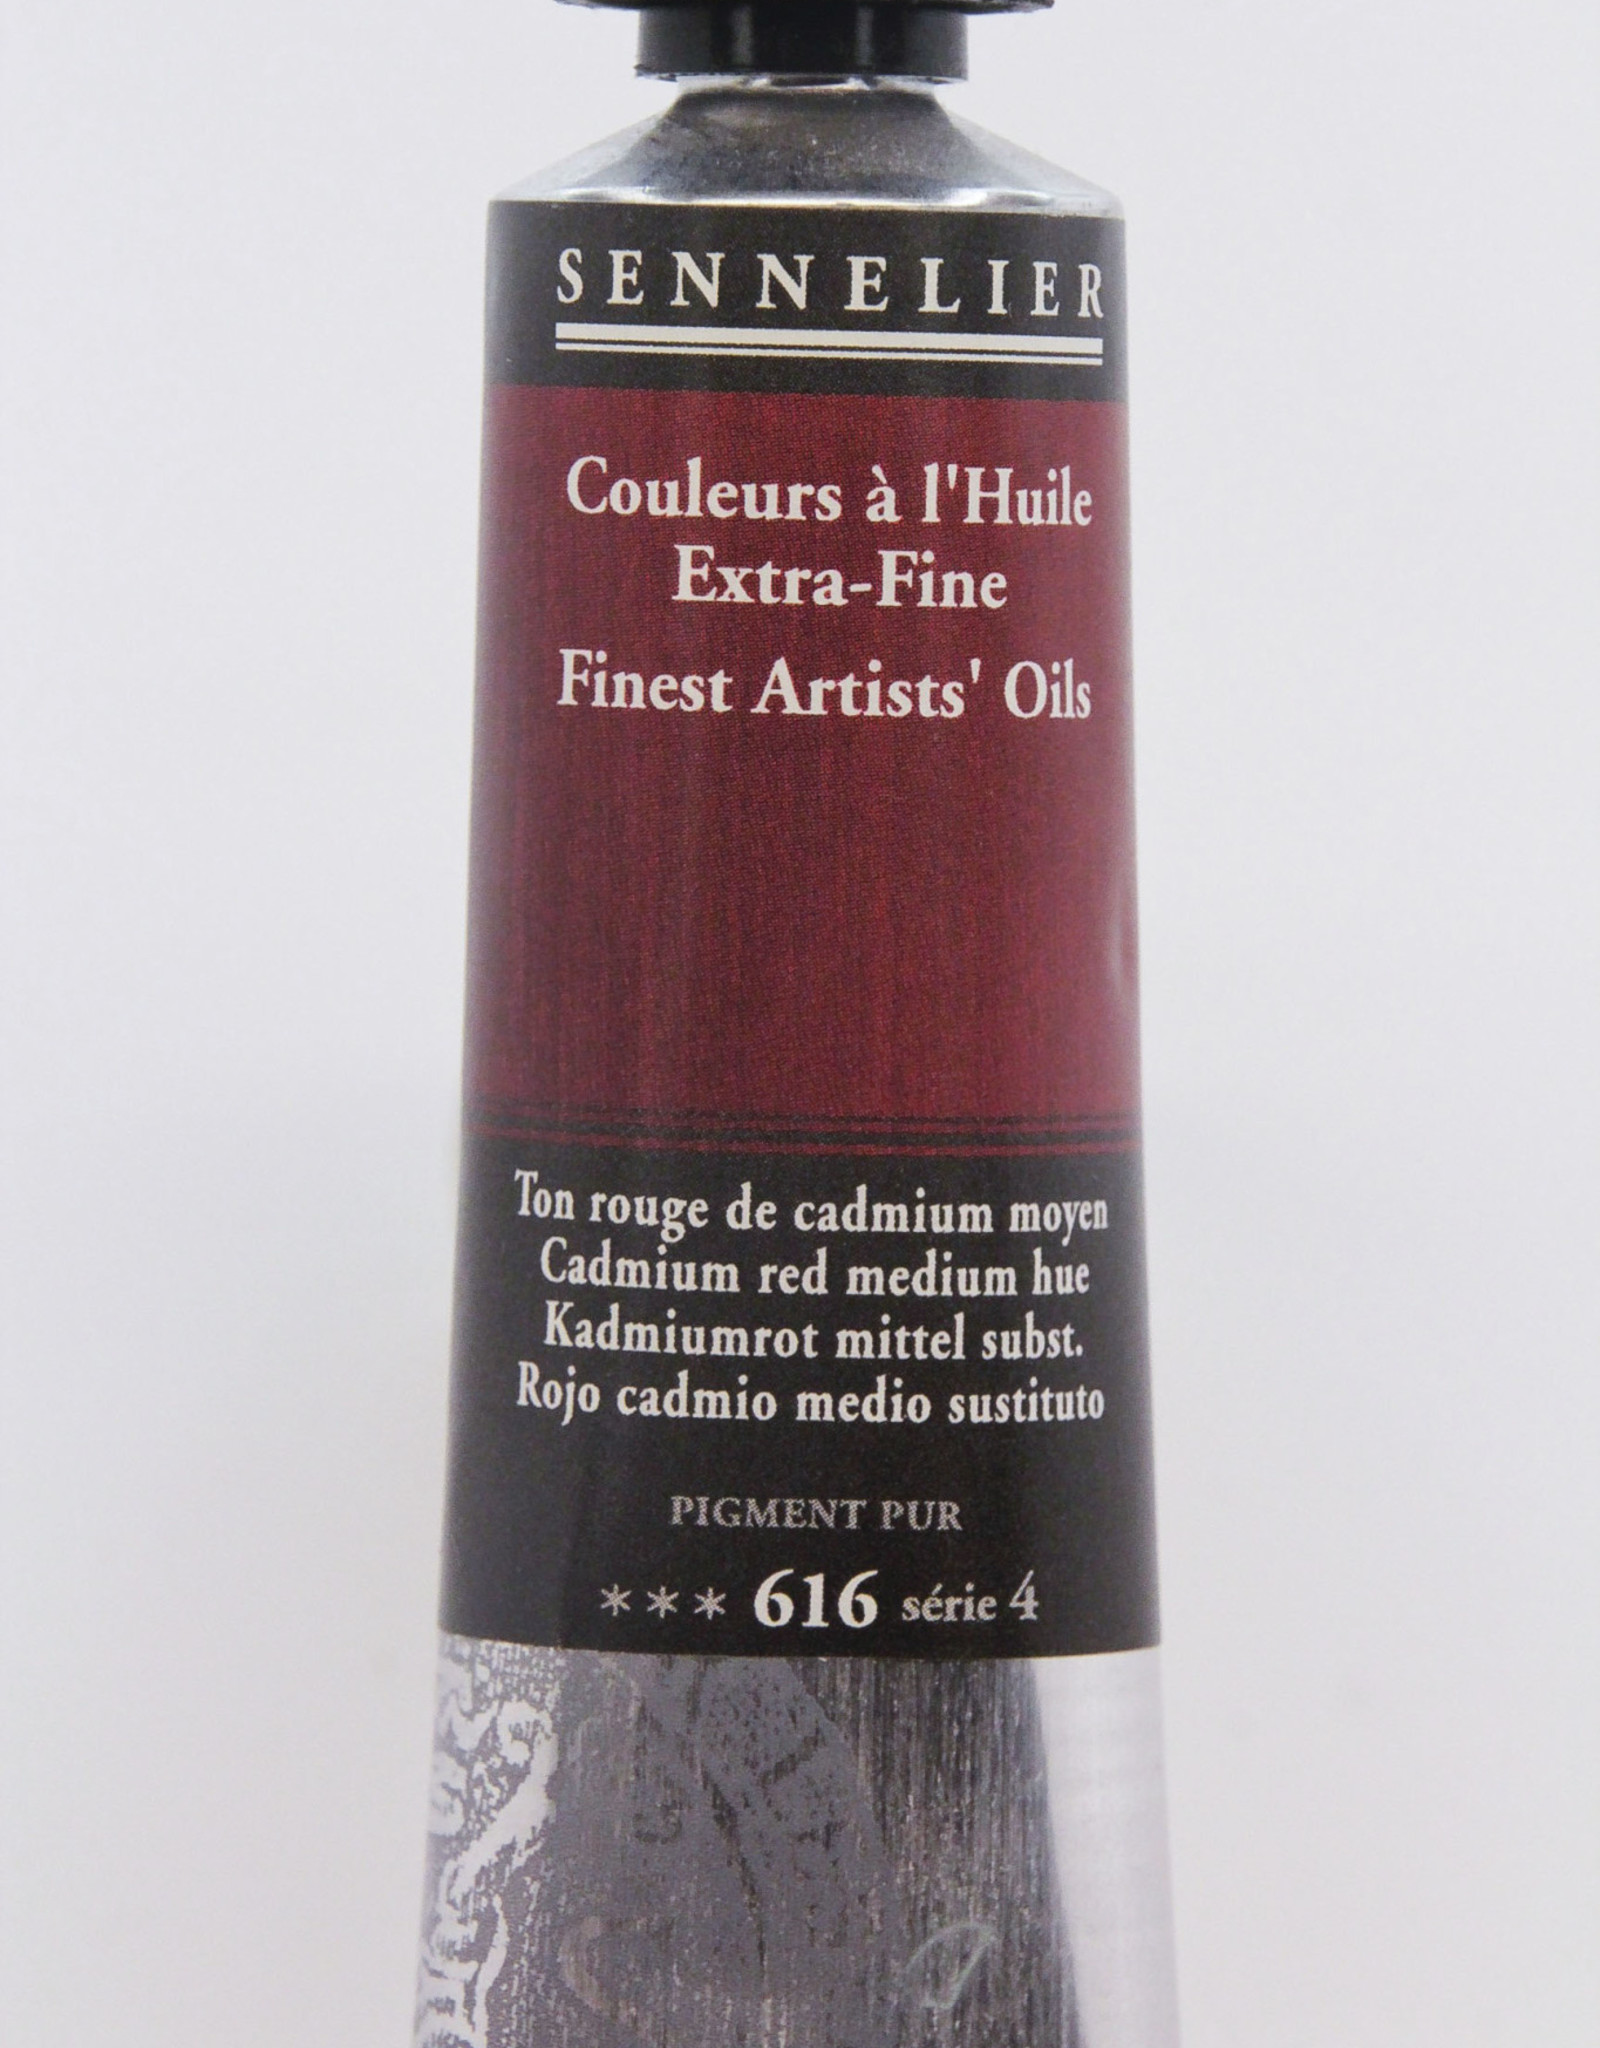 Sennelier, Fine Artists' Oil Paint, Cadmium Red Medium Hue, 616, 40ml Tube, Series 4